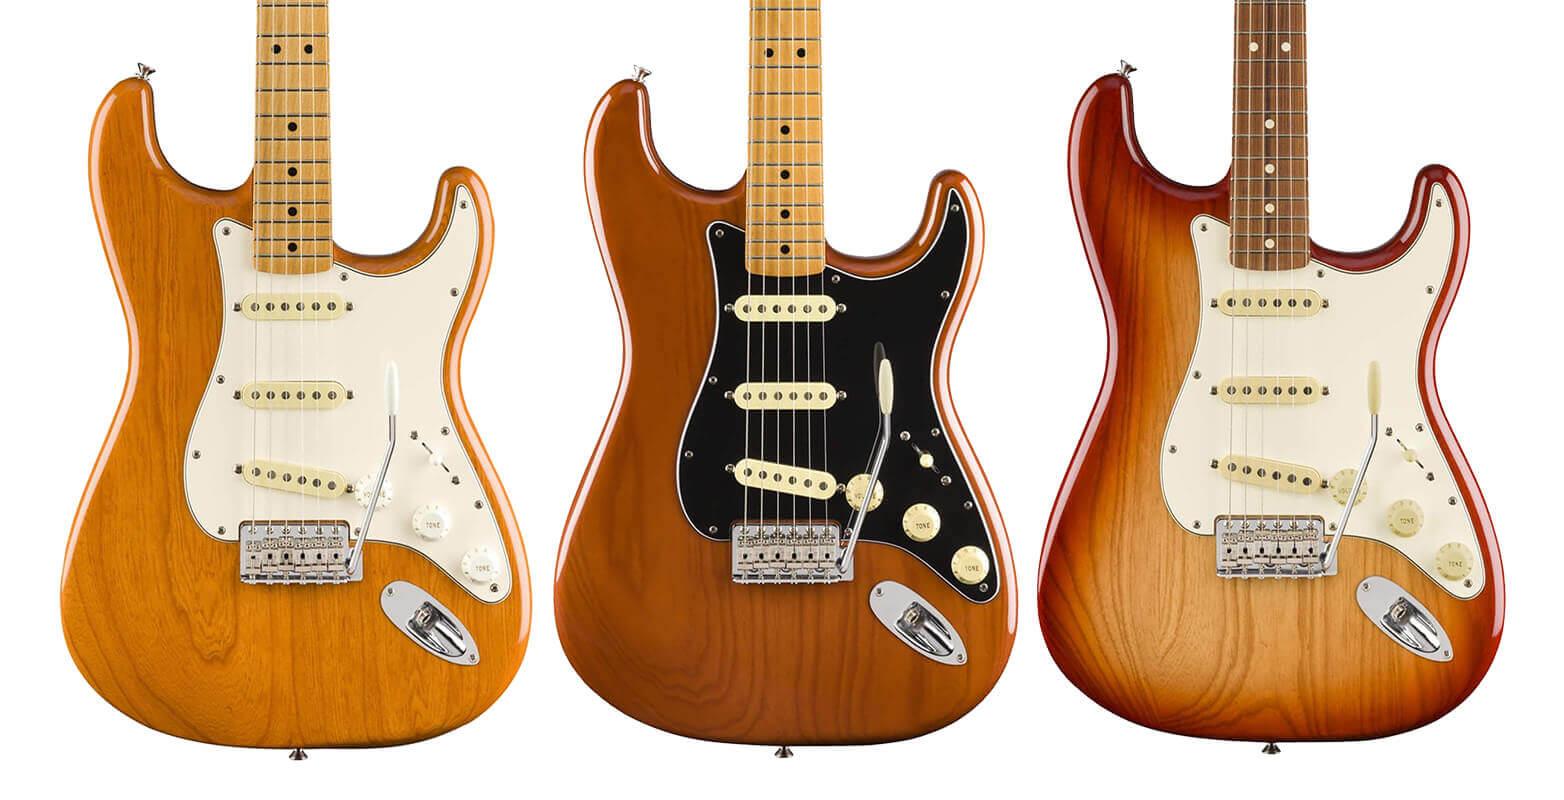 Fender Vintera 70s Stratocaster